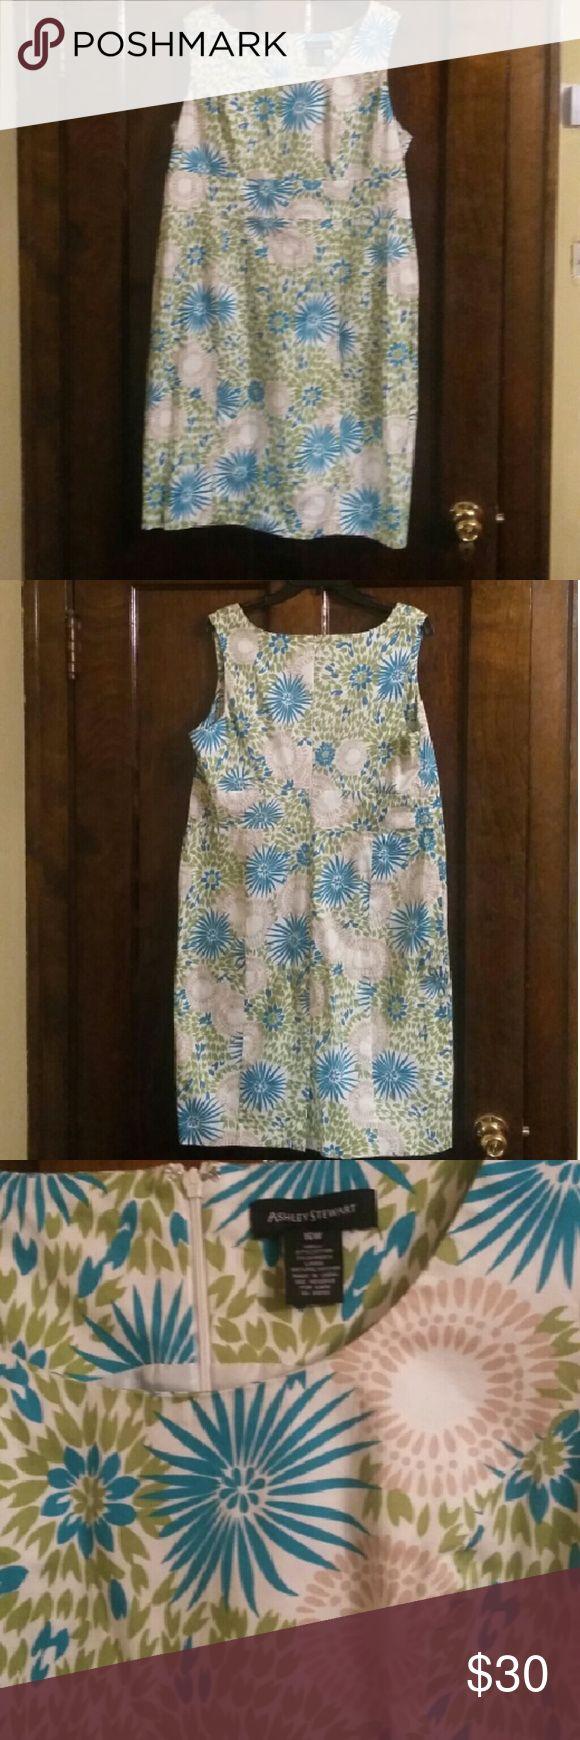 Ashley Stewart dress Very pretty Ashley Stewart dress. It has green beige blue and white in it. It is in great shape. Ashley Stewart Dresses Midi